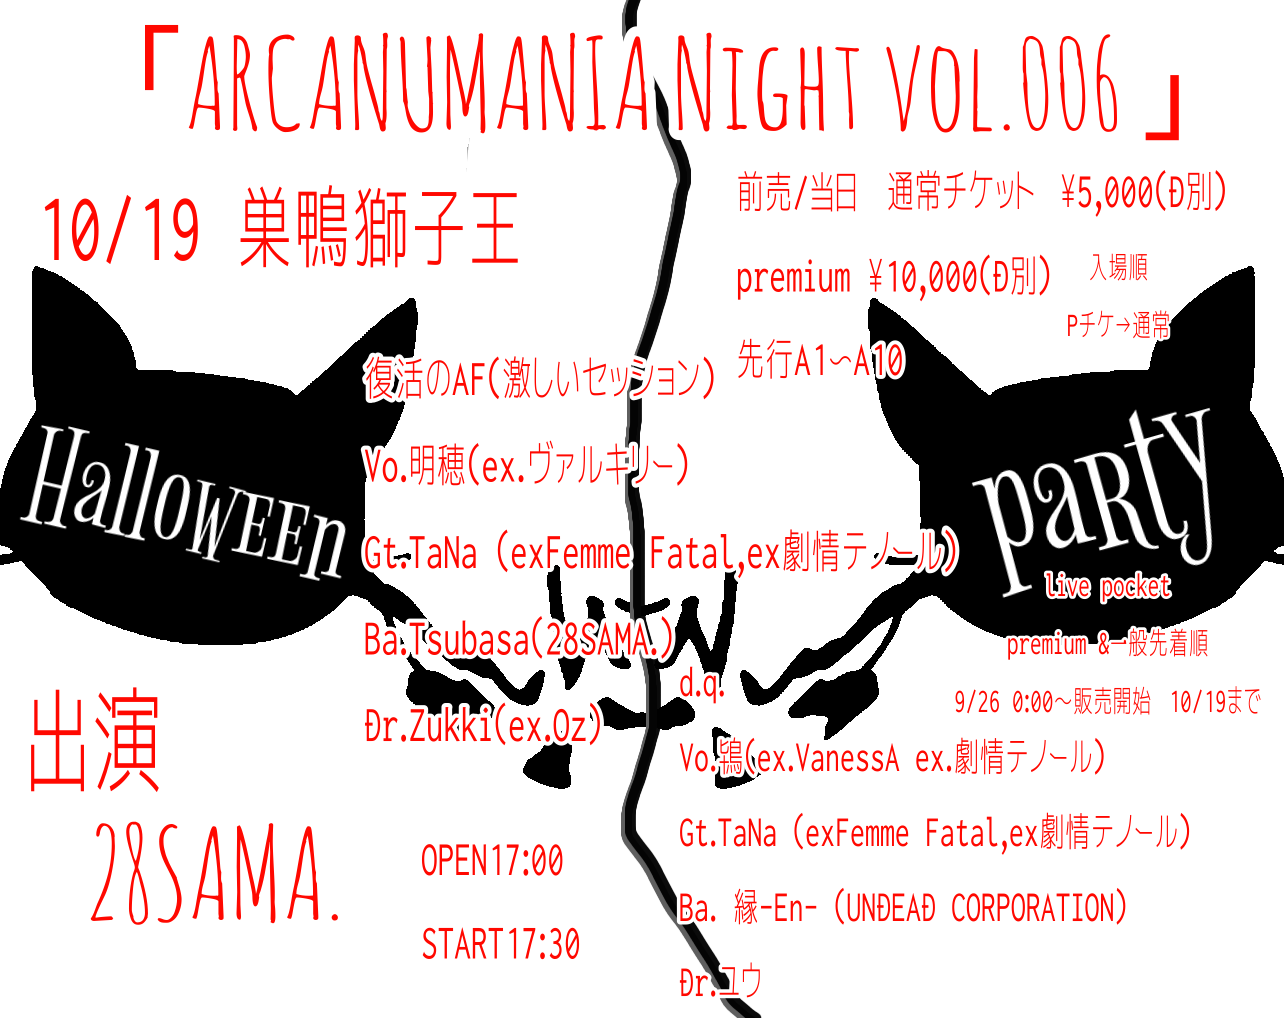 「ARCANUMANIA Night vol.006 Halloween party!」